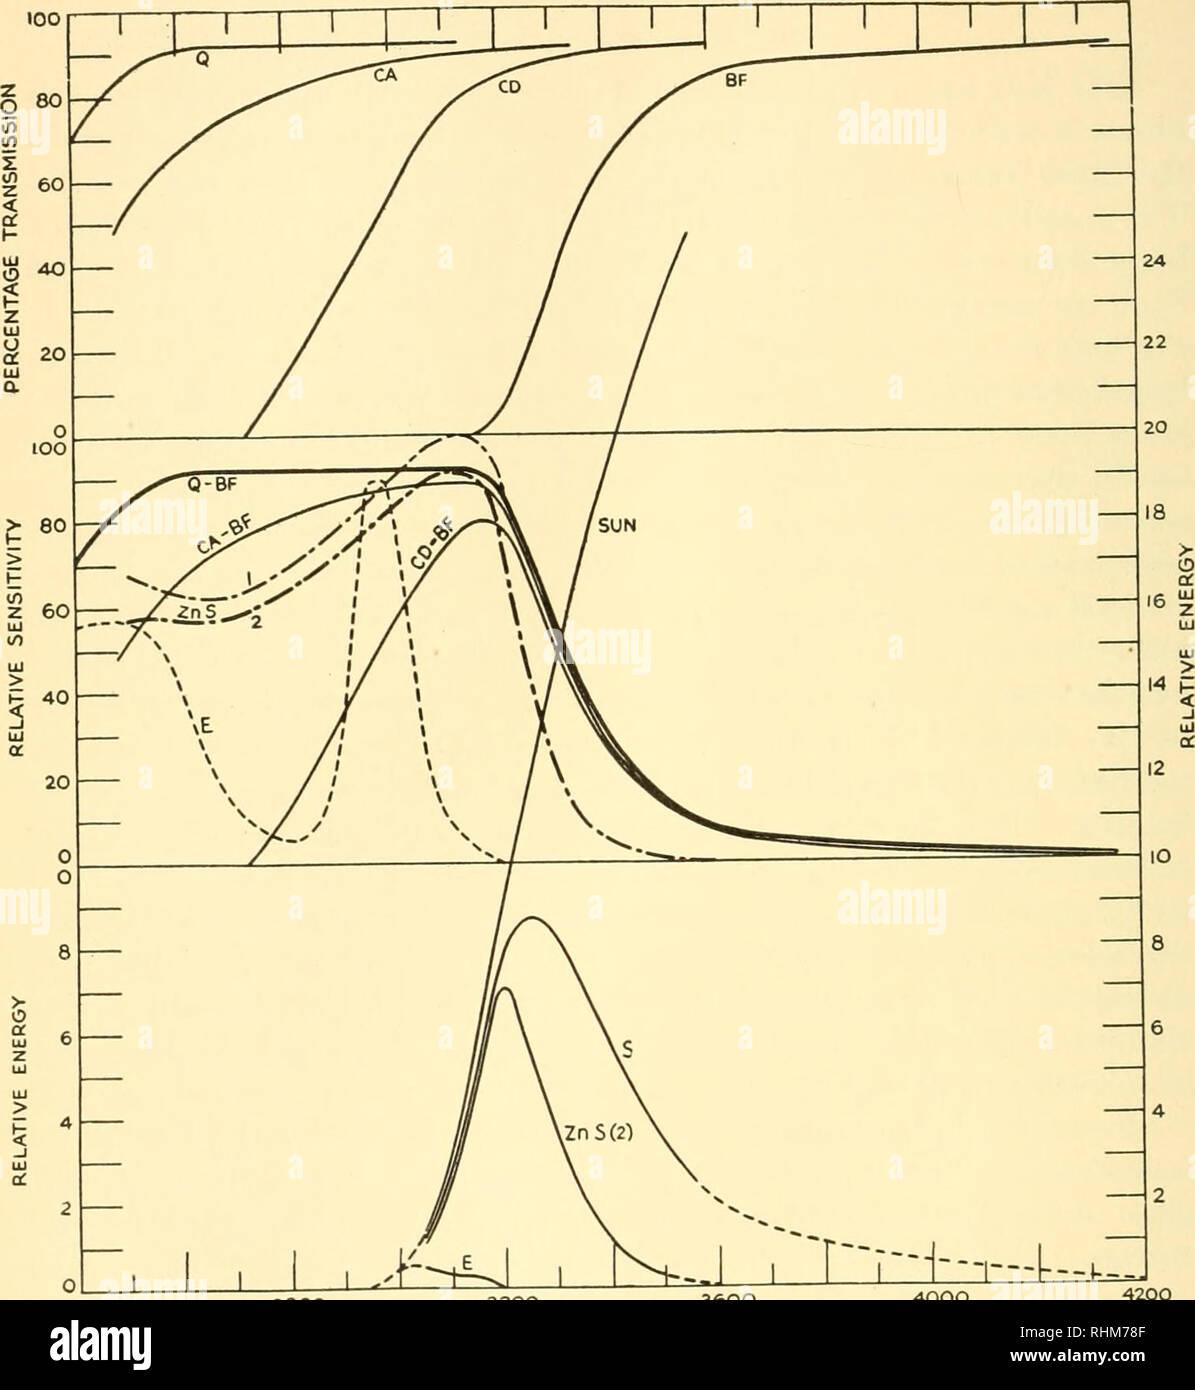 unterschied mitose meiose tabelle